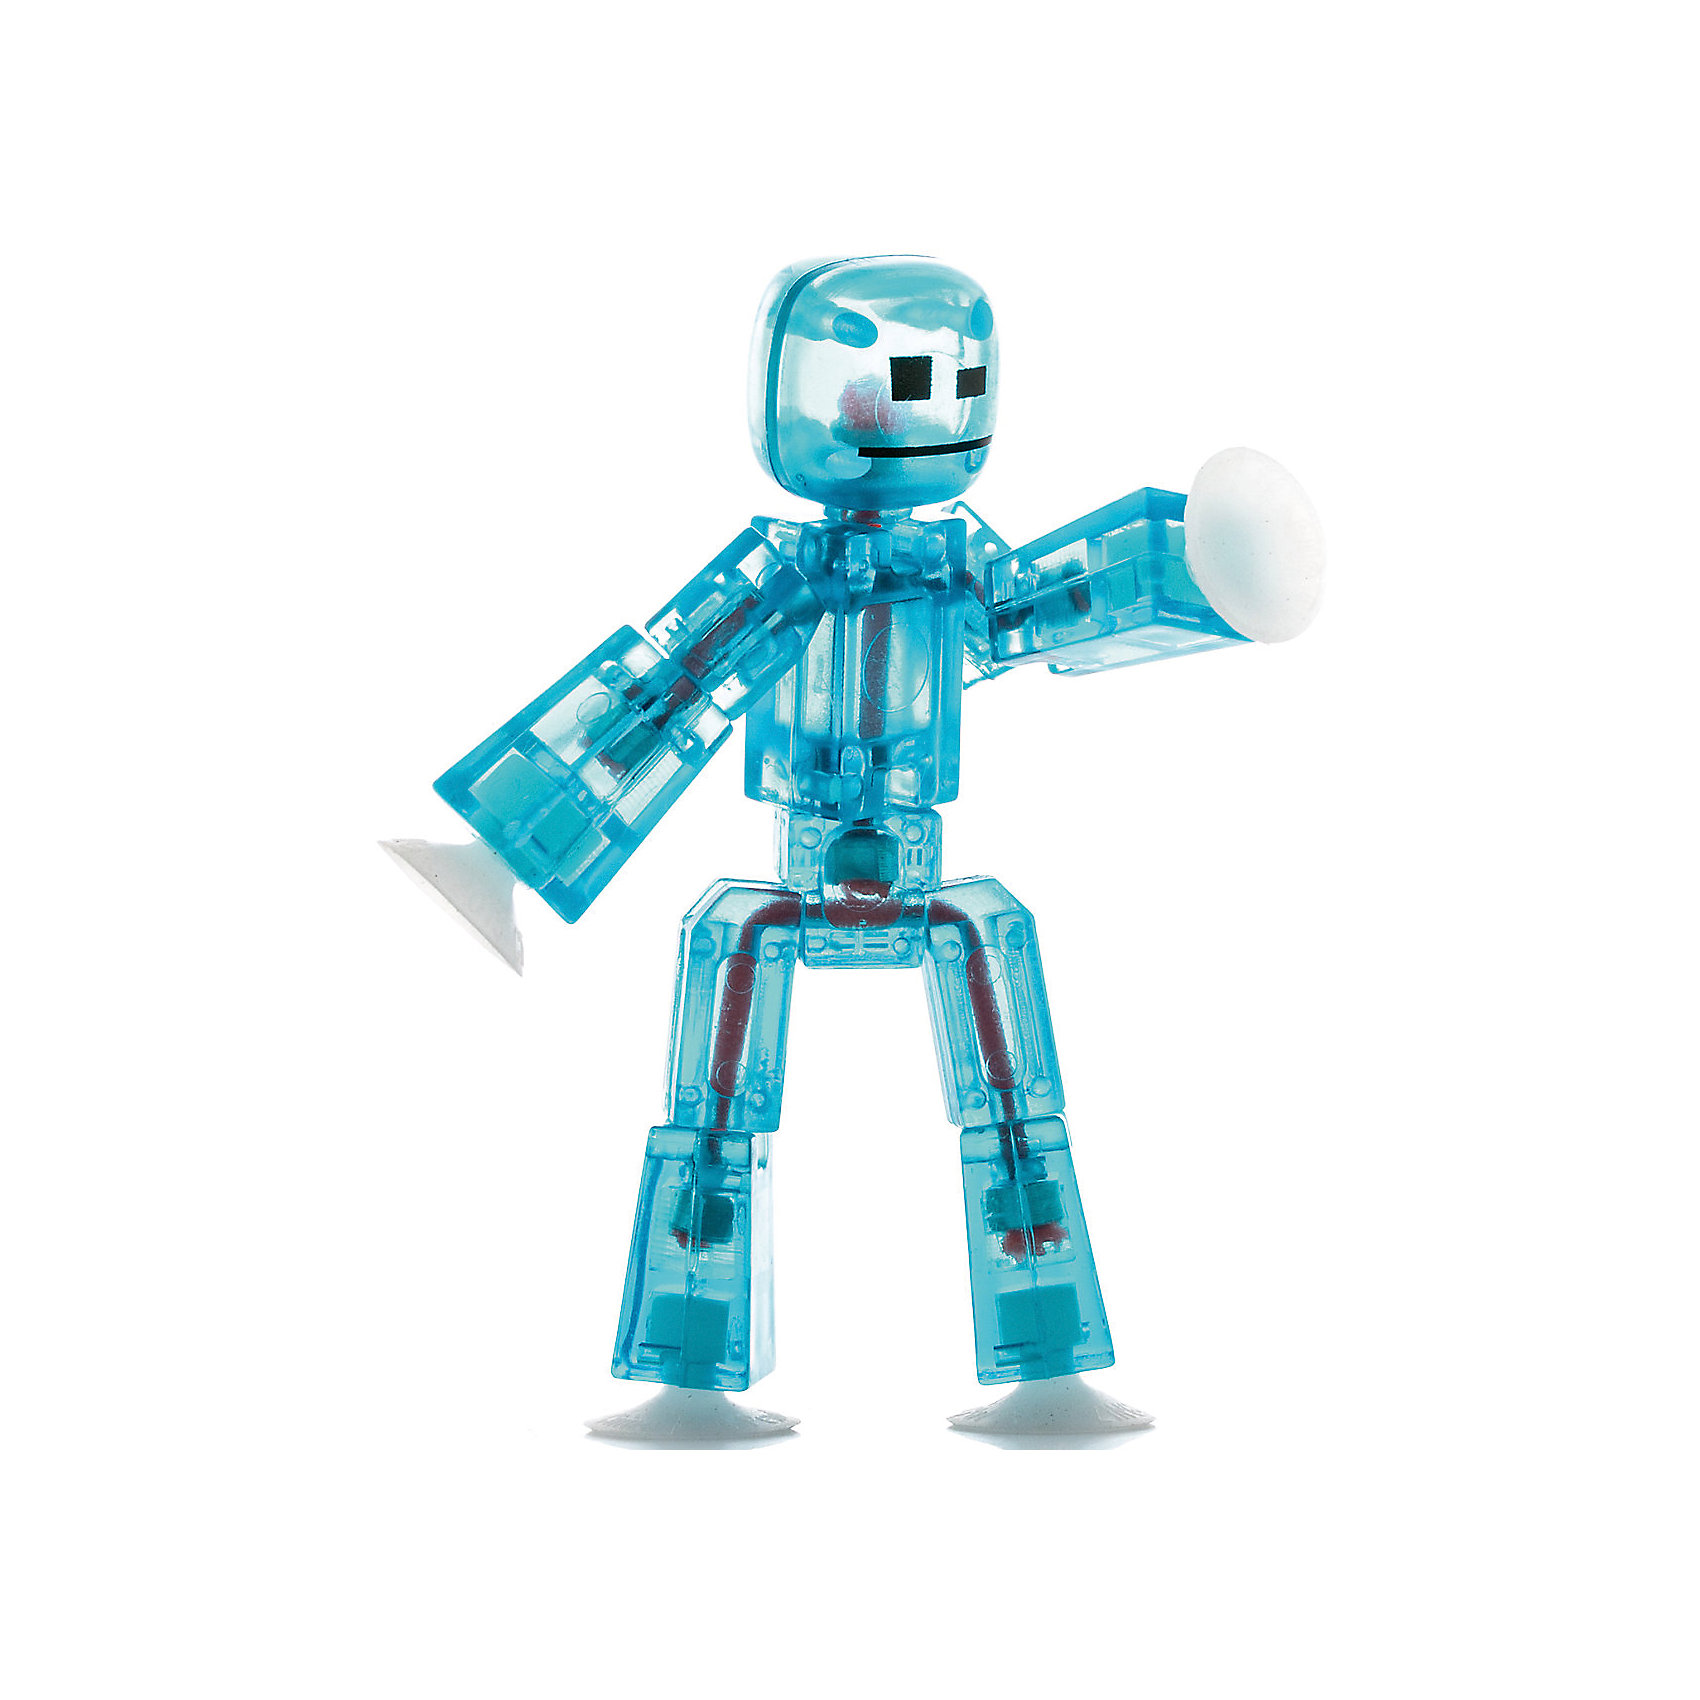 - Игрушка-фигурка, синяя, Stikbot фигурка stikbot 8 см в ассортименте